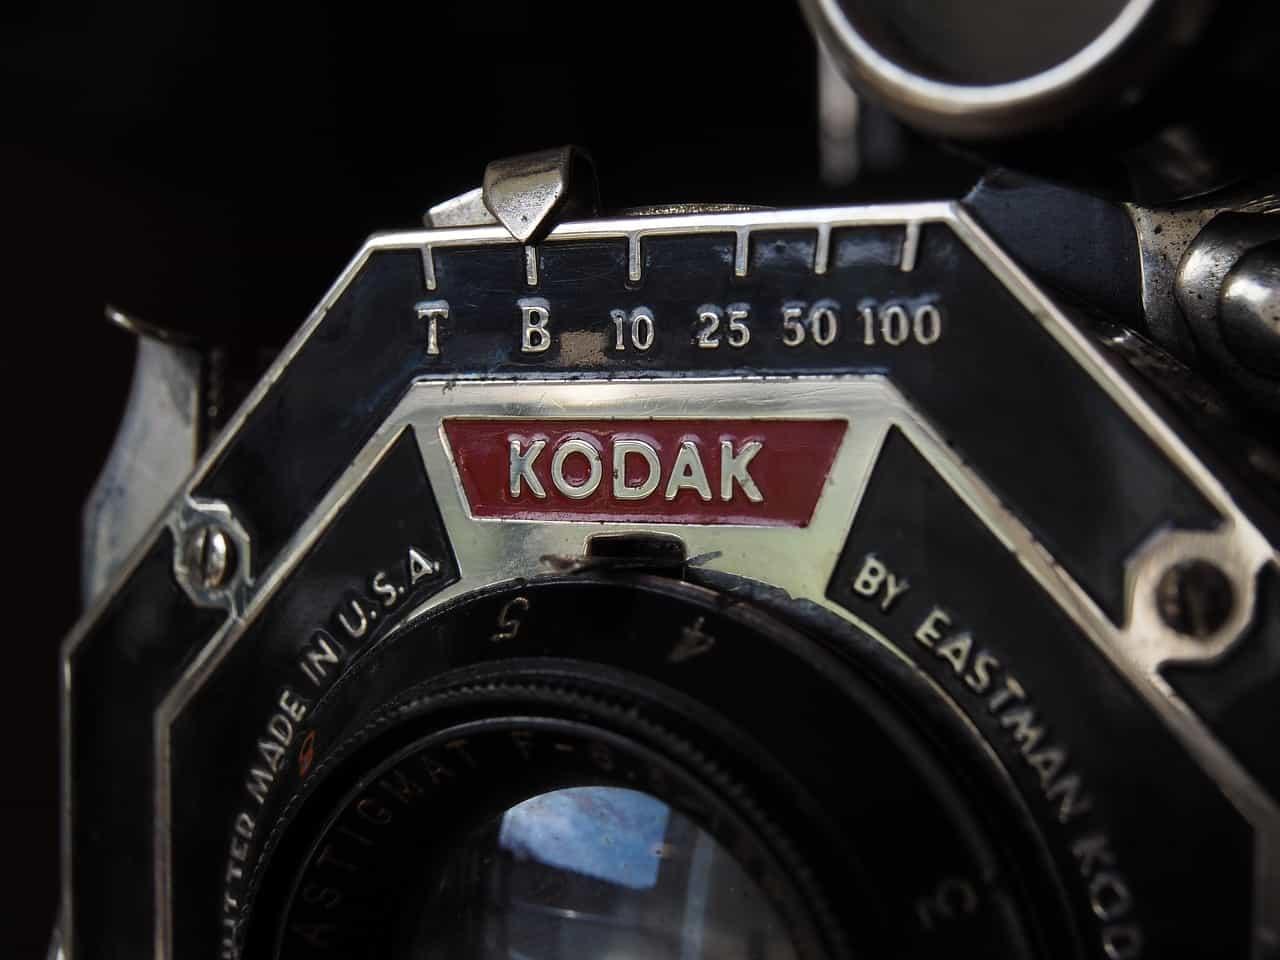 an old kodak camera